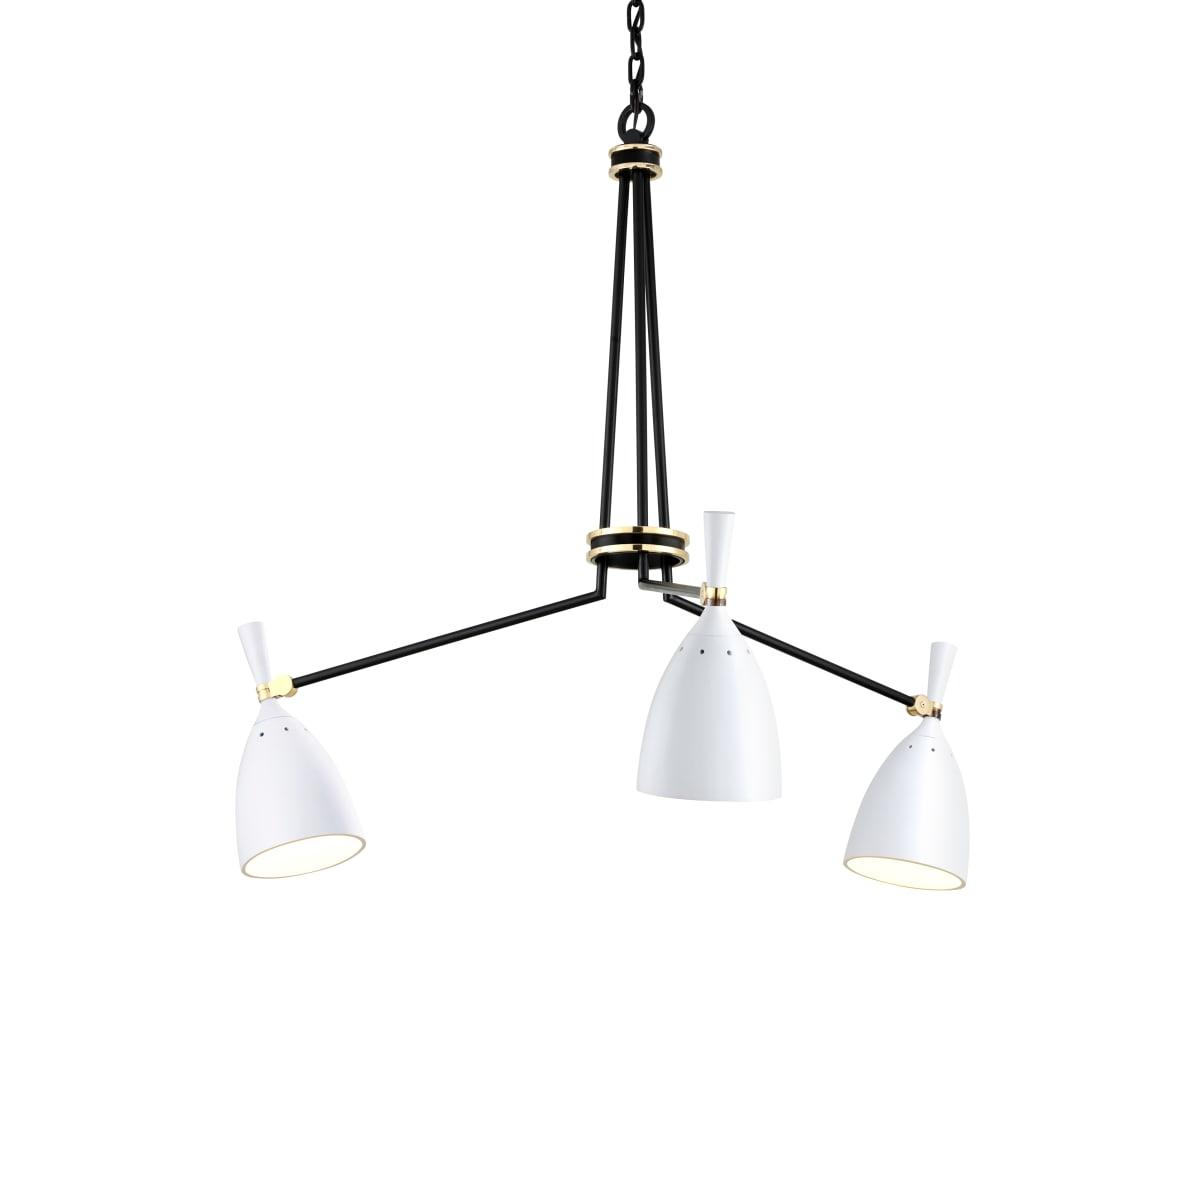 Corbett Lighting 281 03 Satin Black